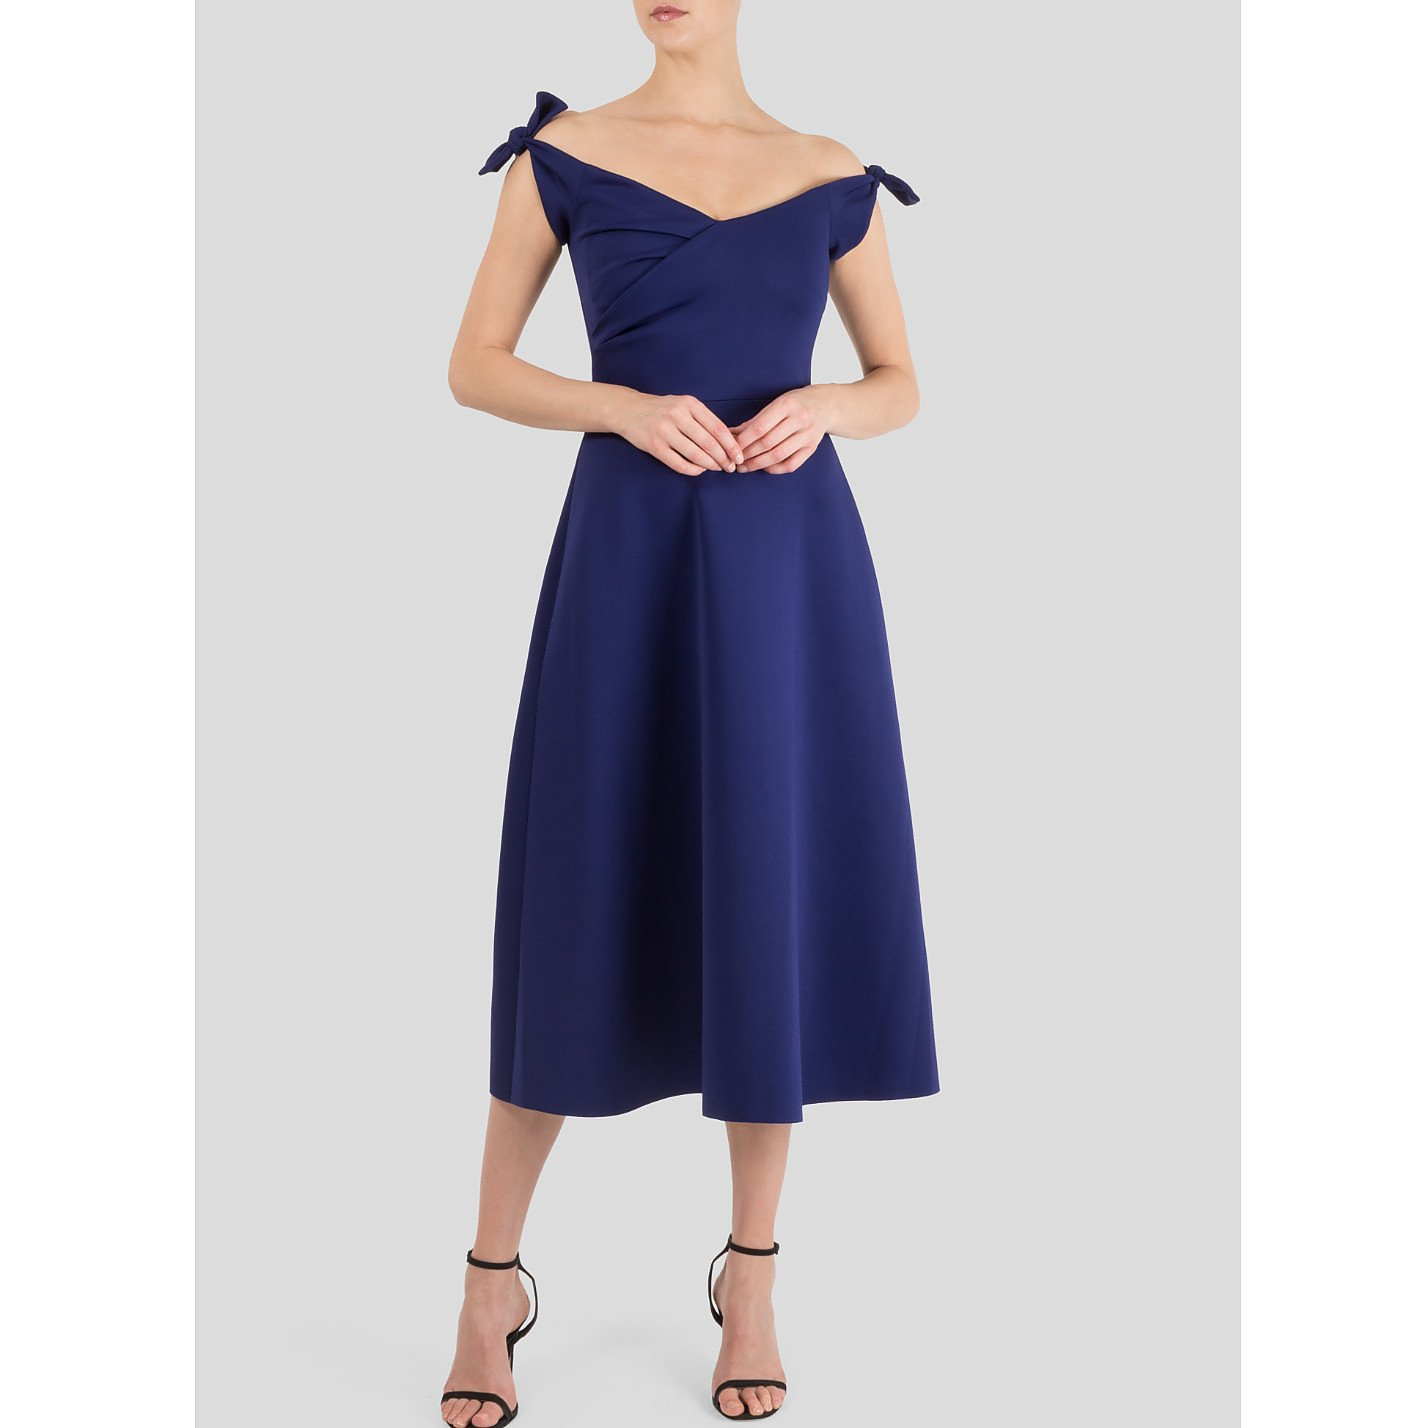 Saloni Ruth Off-The-Shoulder Stretch Dress